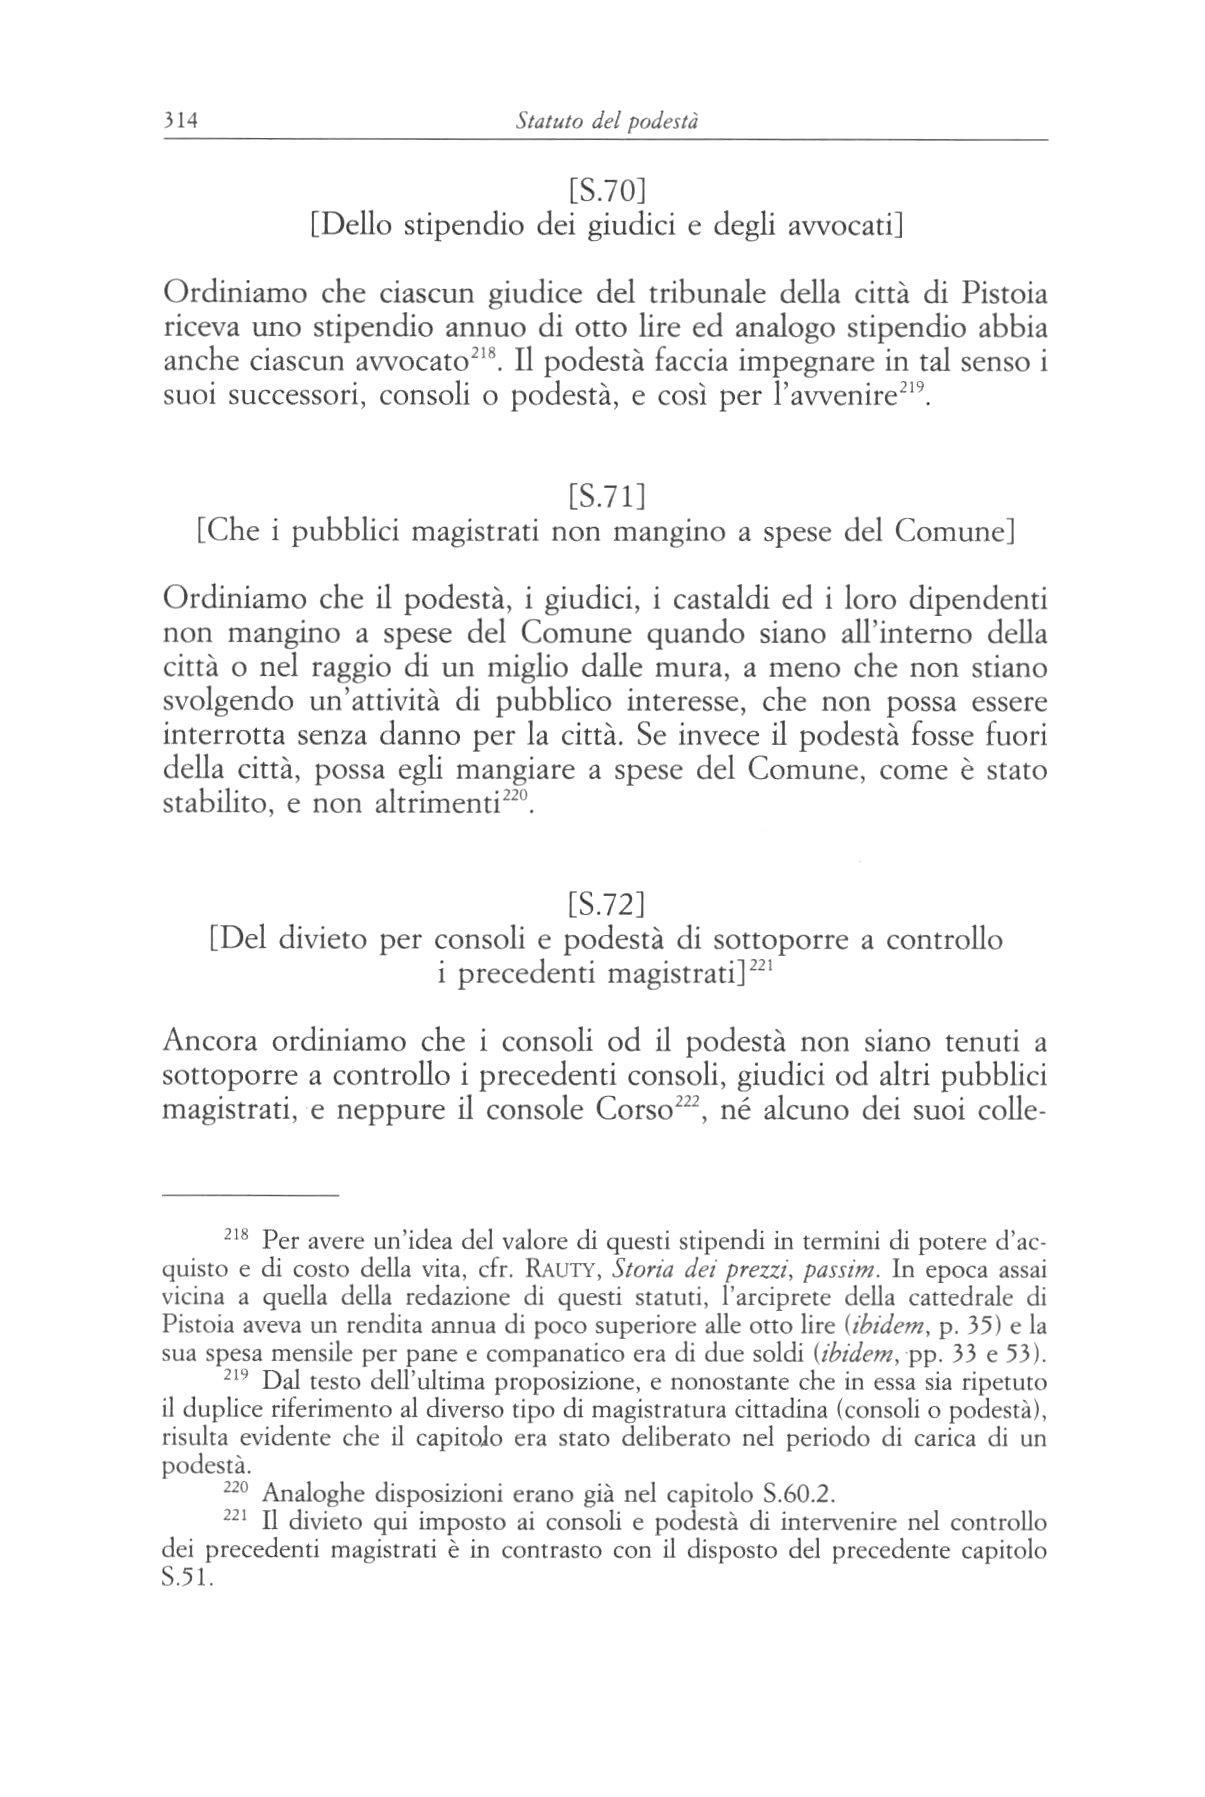 statuti pistoiesi del sec.XII 0314.jpg